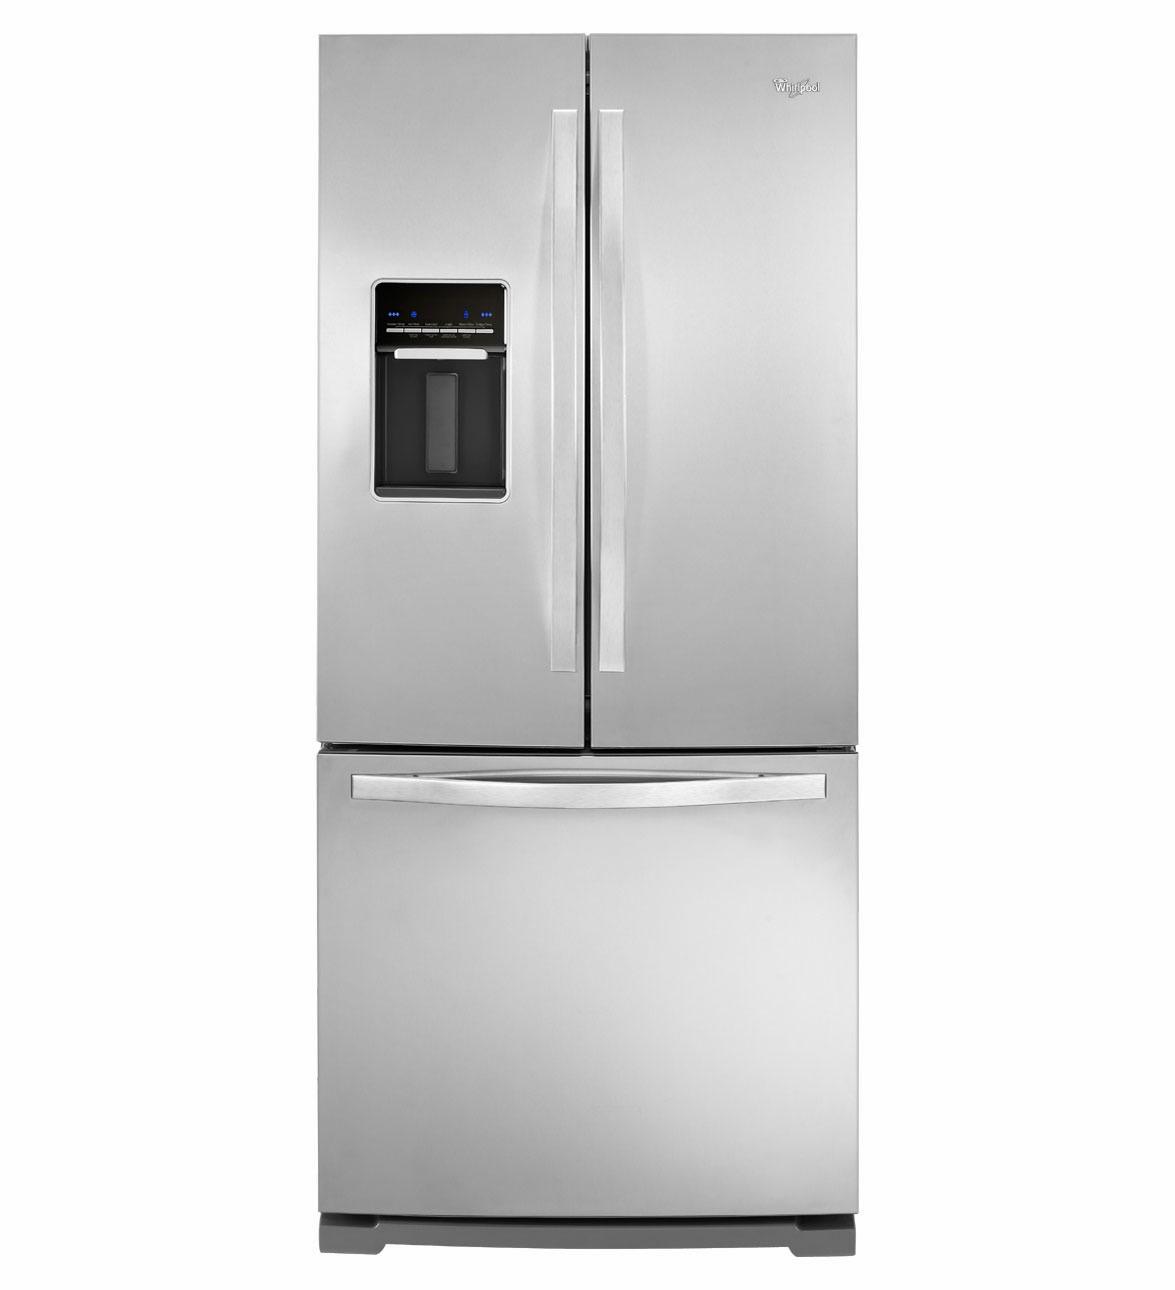 Whirlpool Refrigerator Brand: Whirlpool WRF560SEYM French